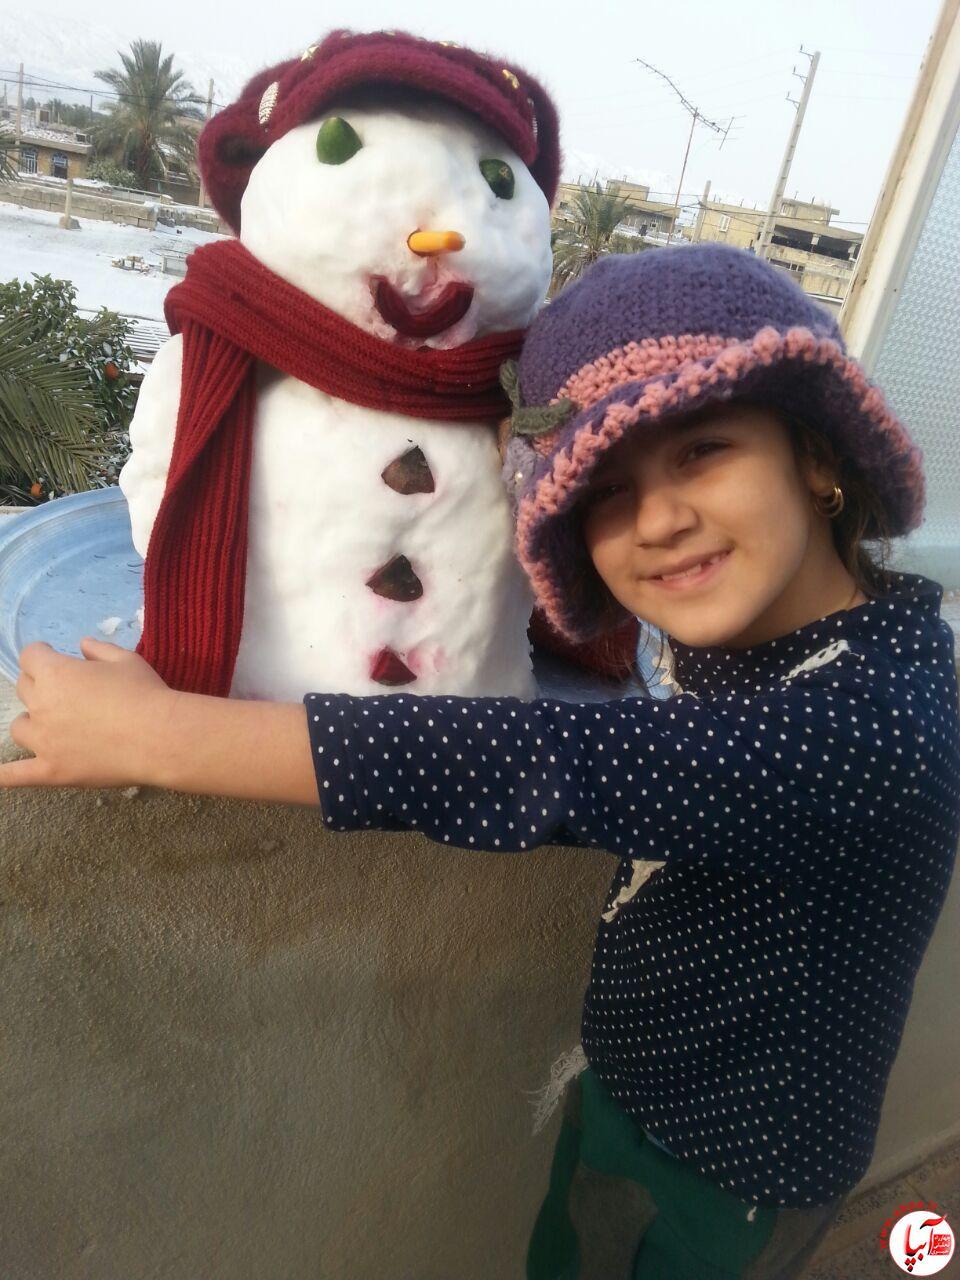 زهرا-عالیشوندی گالری عکس زمستانه ی کودک آبپا